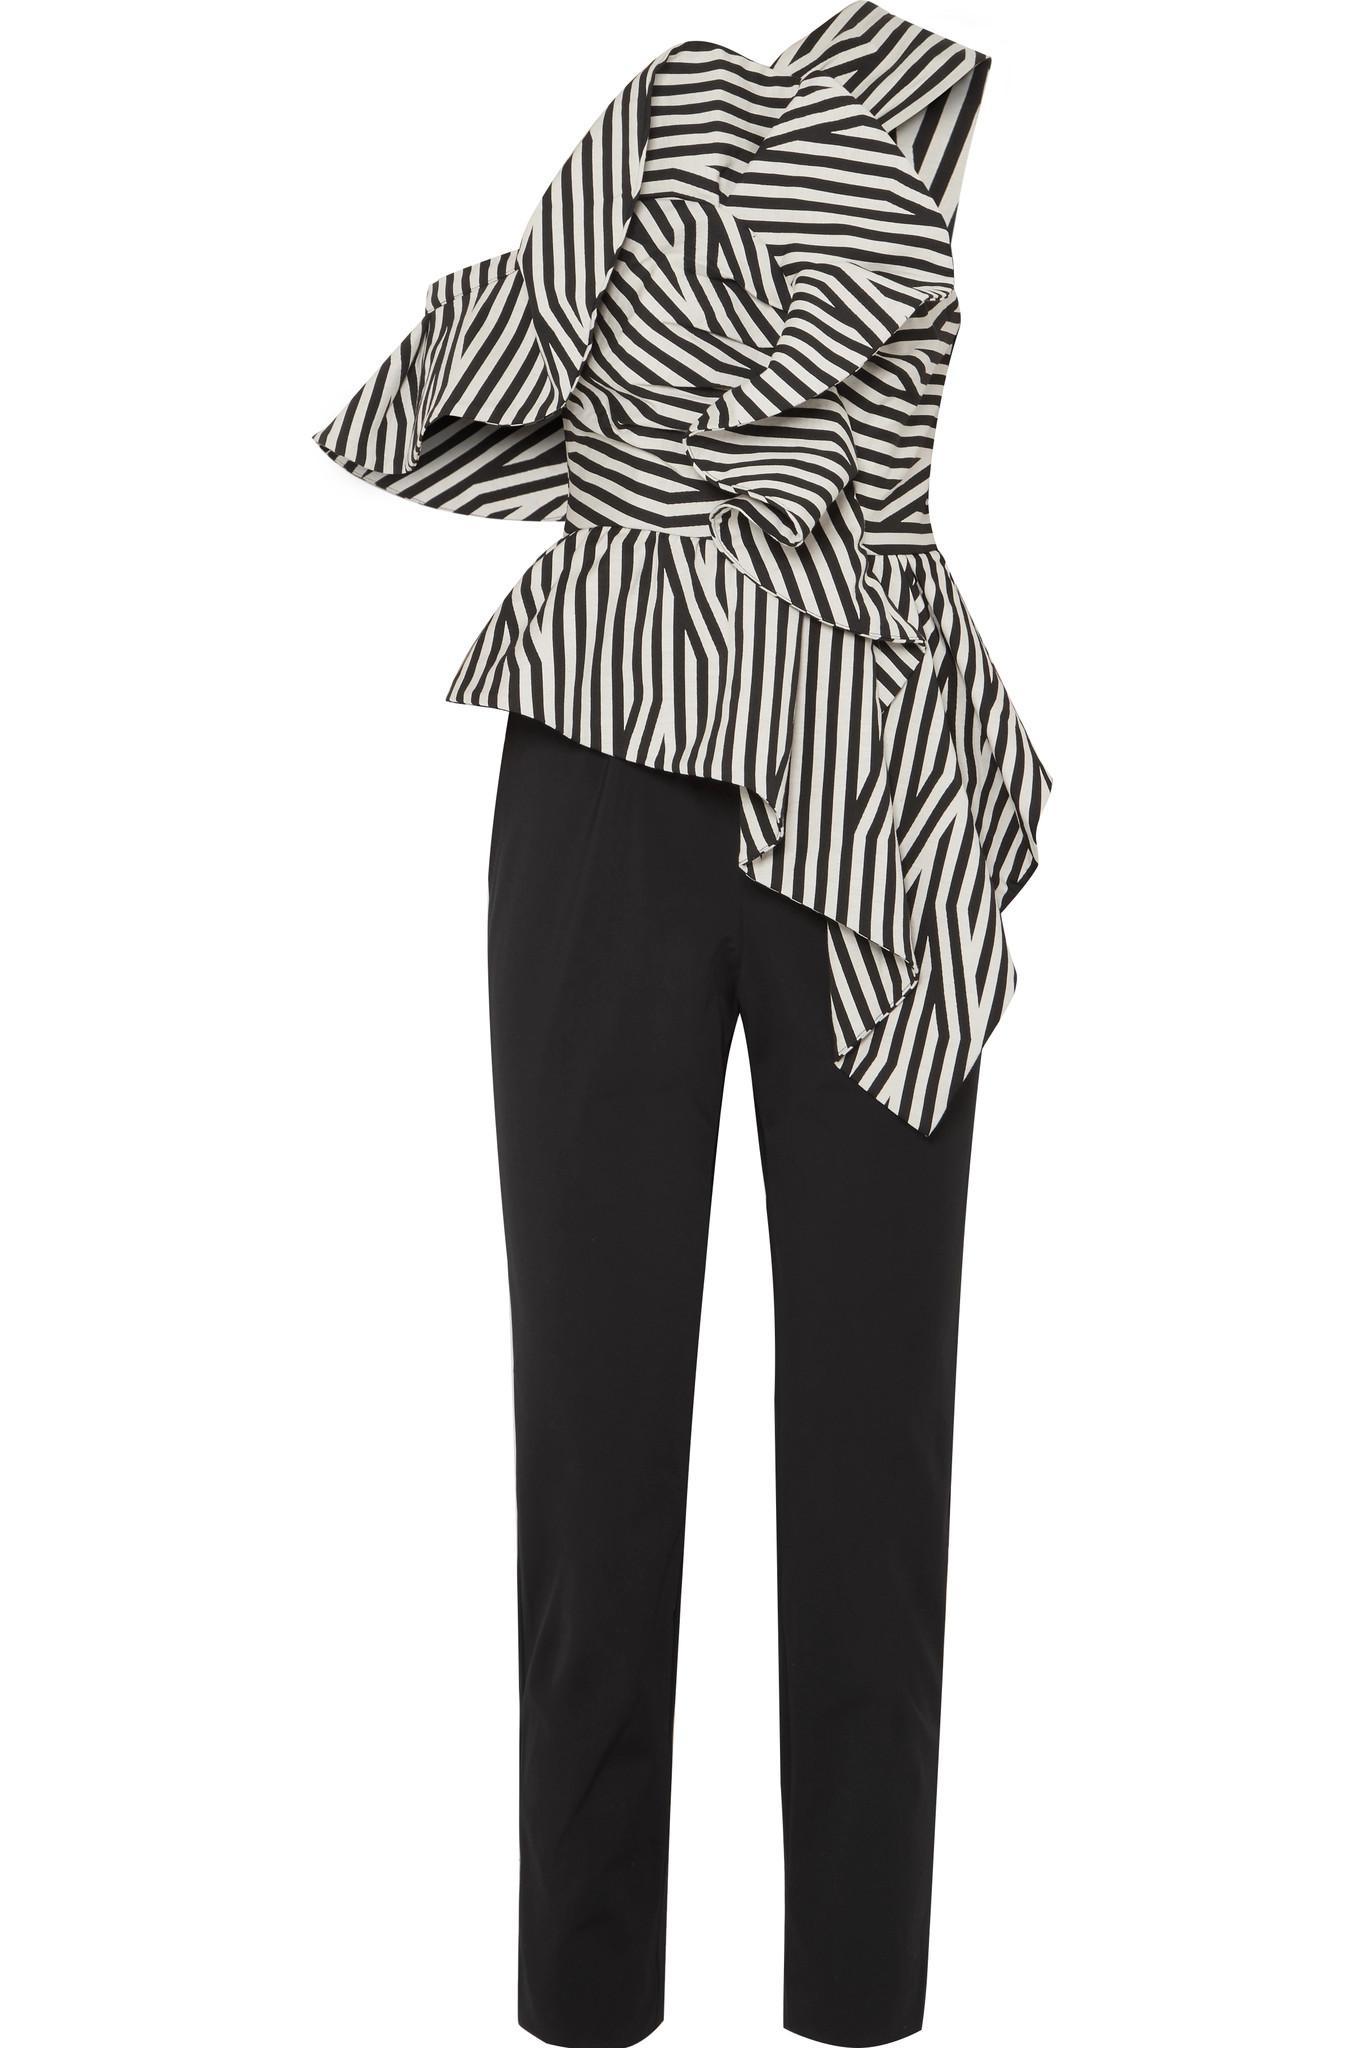 c1c6bb830cd9 Self-Portrait Ruffled Striped Poplin Jumpsuit in Black - Lyst